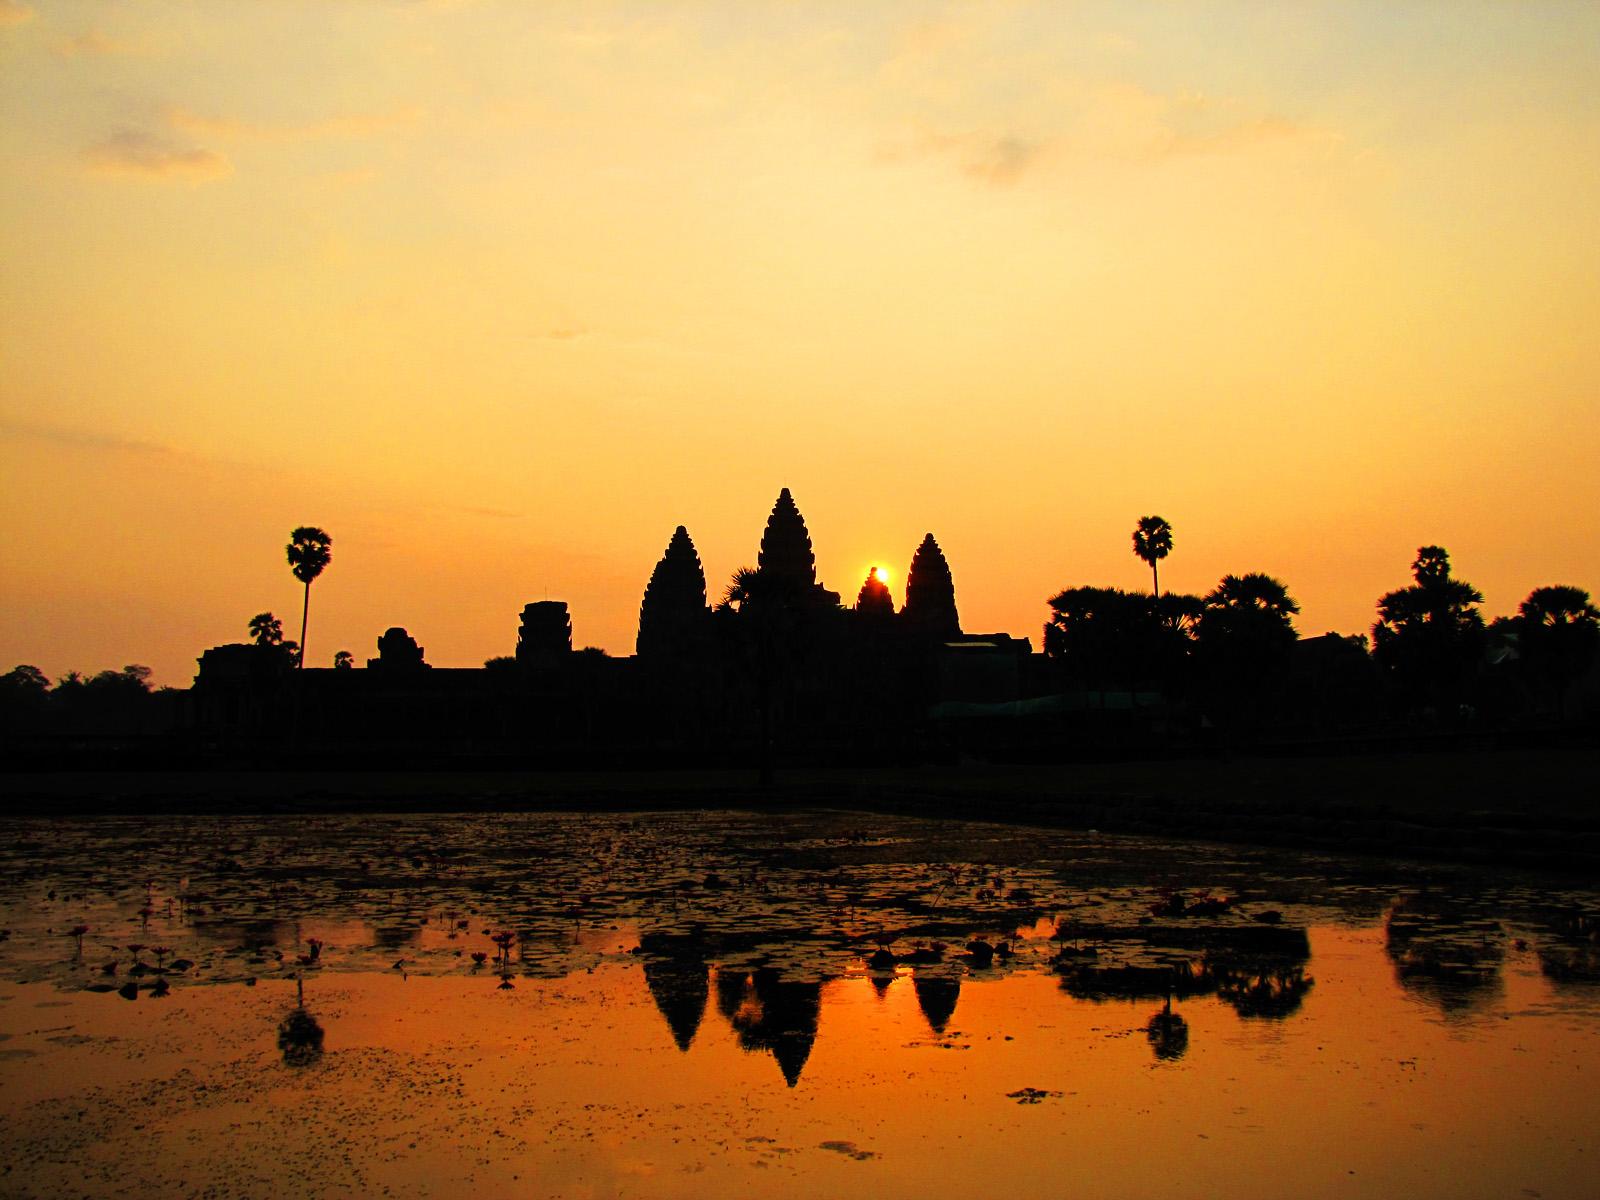 http://beautifulplacestovisit.com/wp-content/uploads/2010/04/Angkor_Wat_Cambodia1_Sunrise.jpg